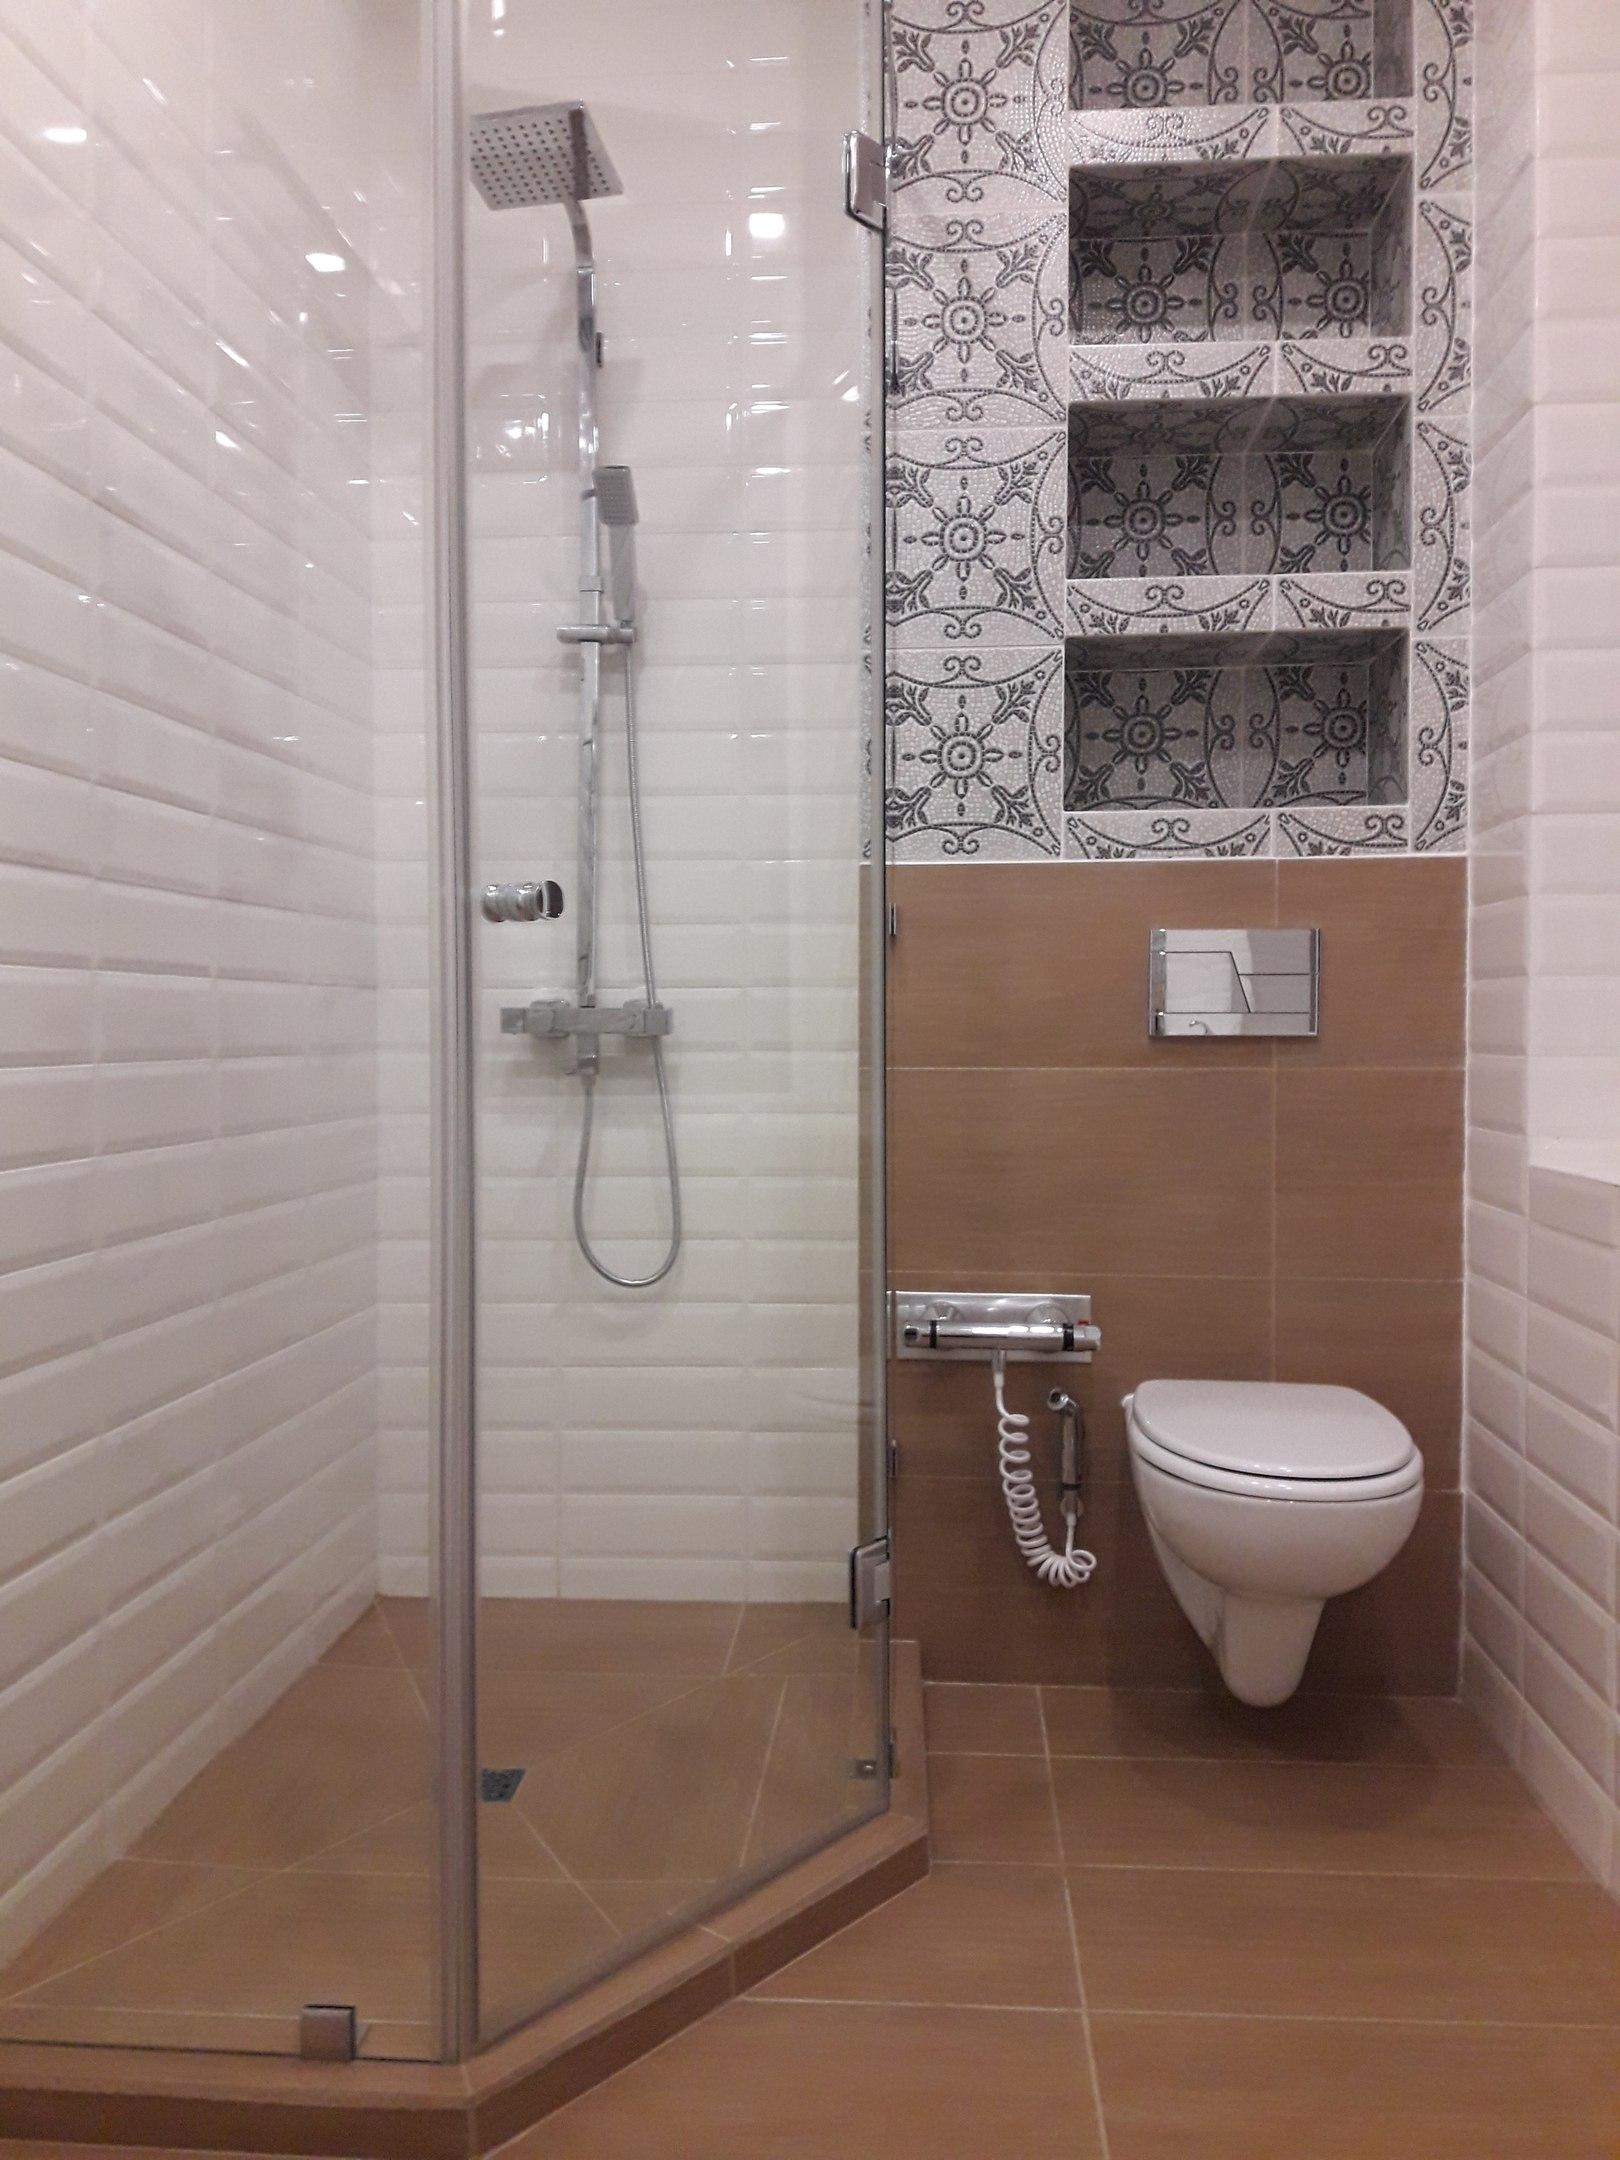 Дизайн-проект для ванных комнат фото f_5035b9e1858704eb.jpg